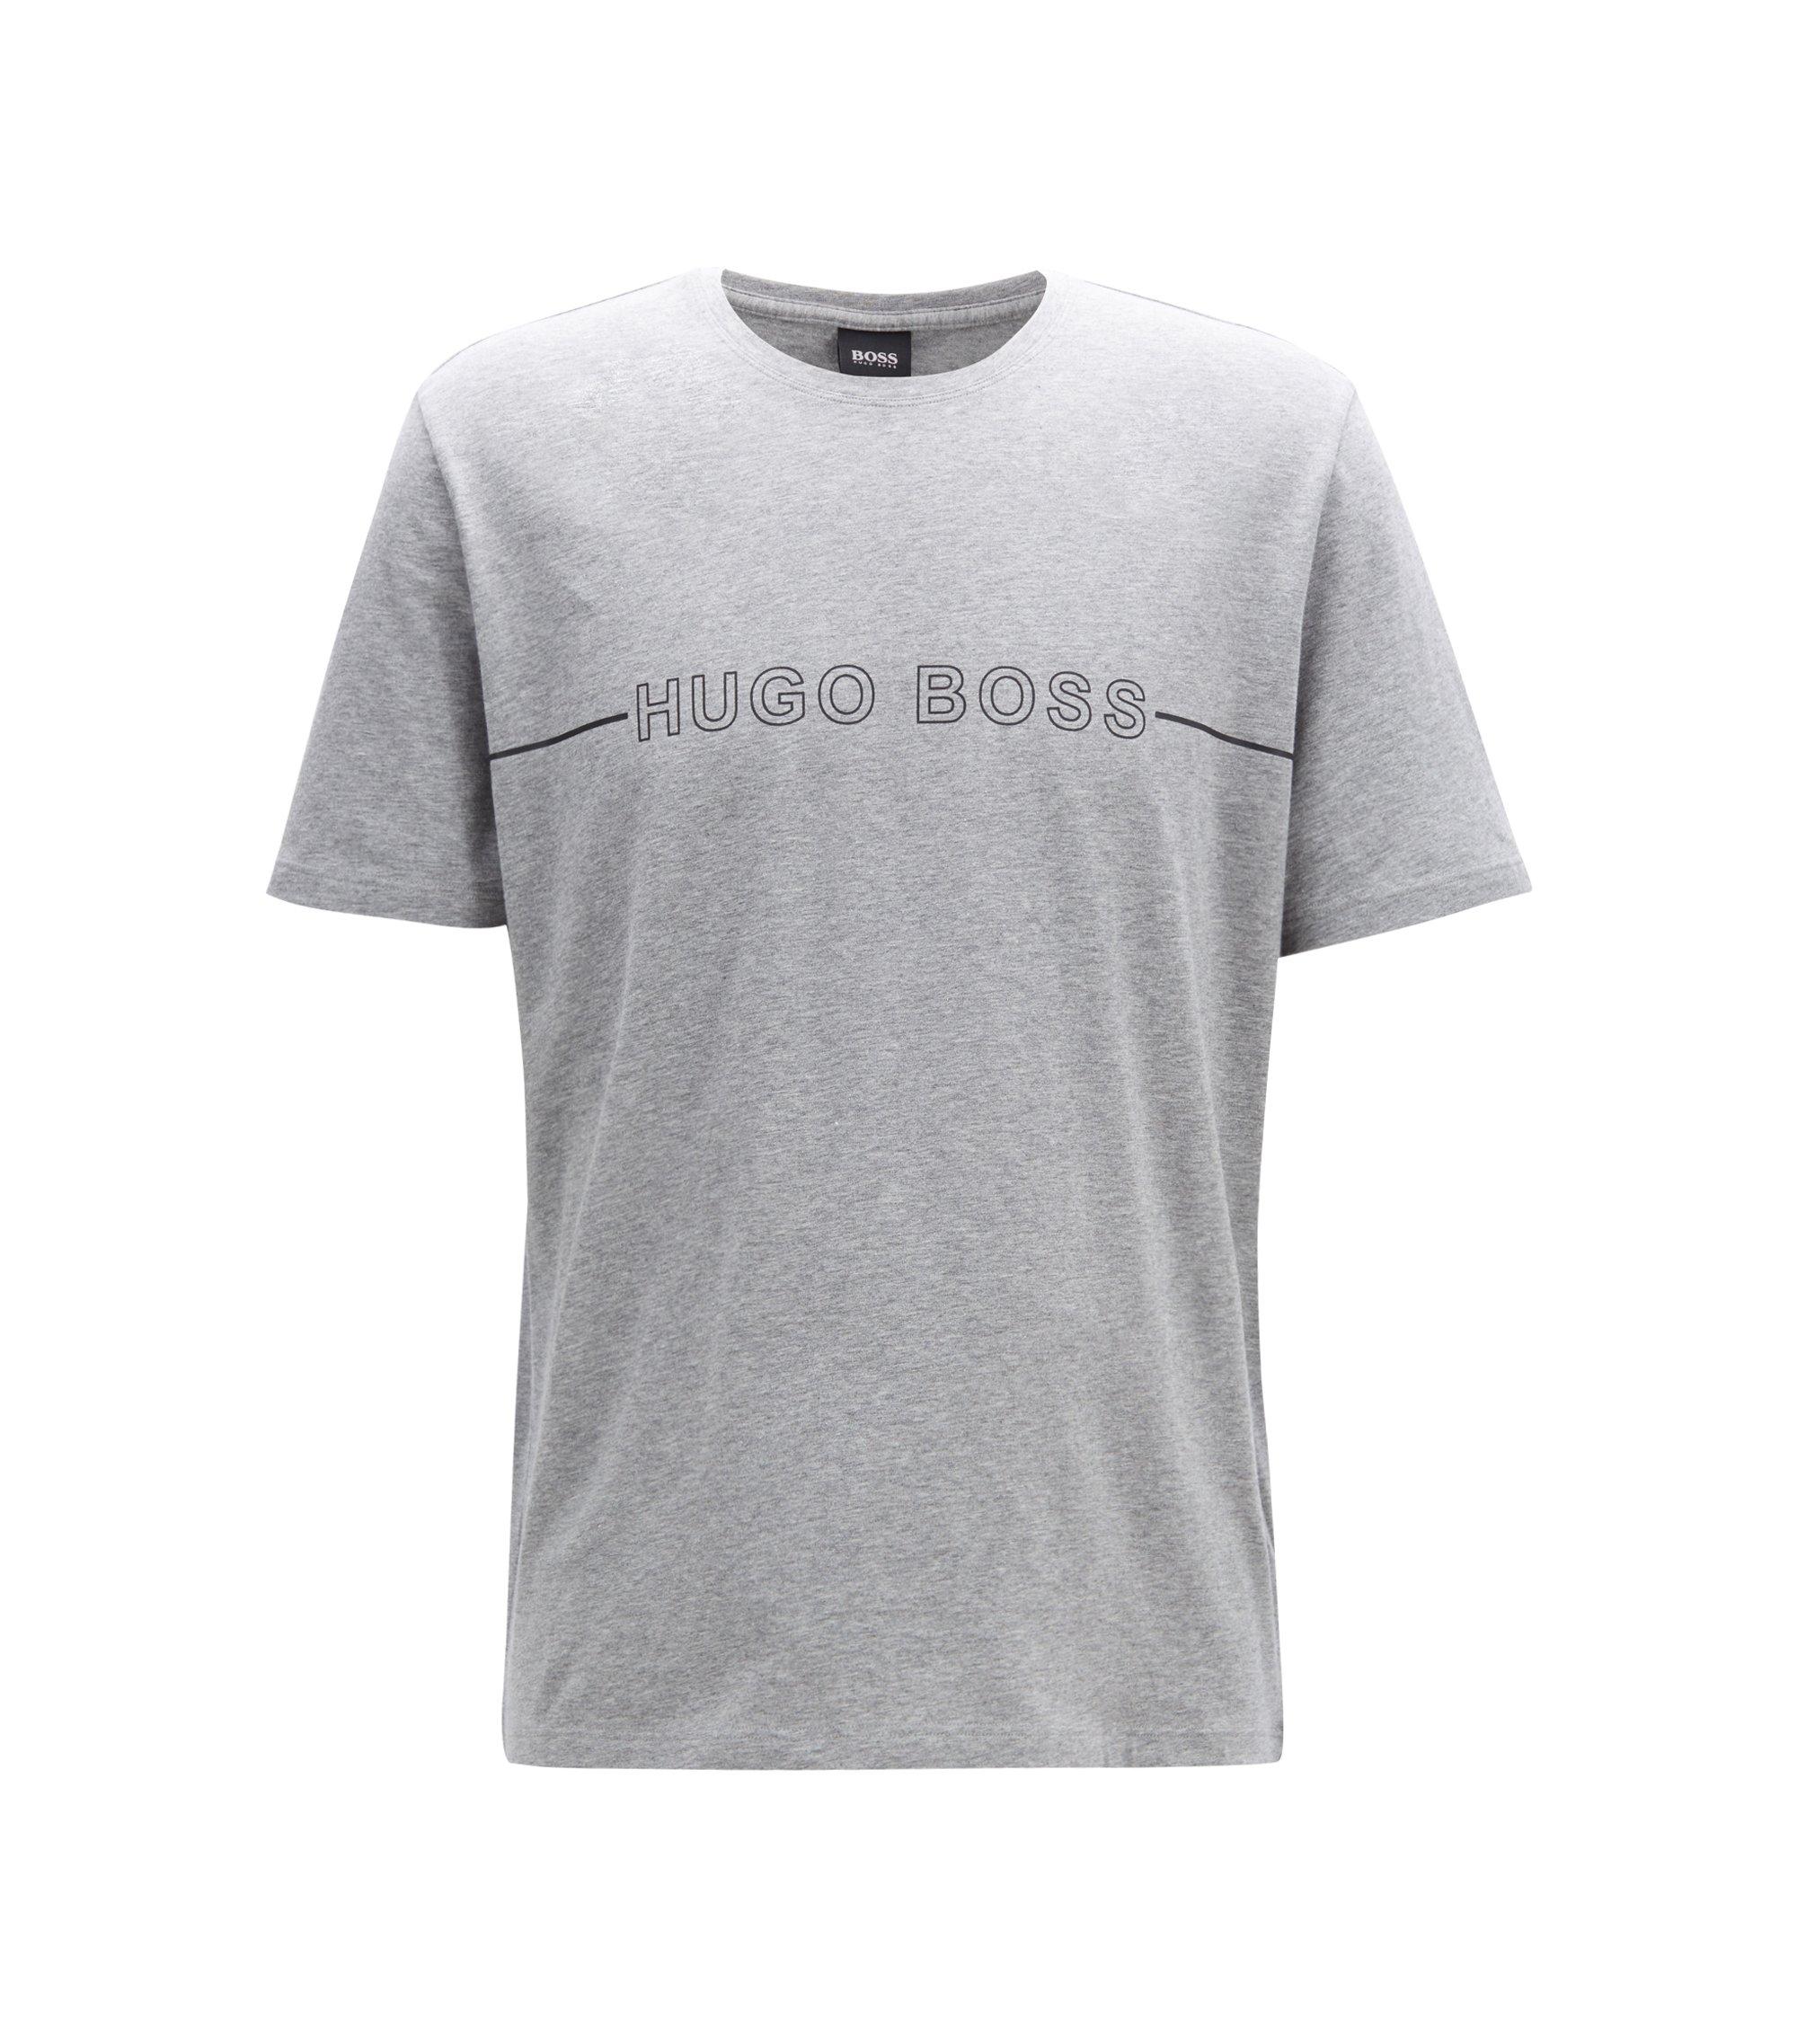 Pyjama-Shirt aus Stretch-Jersey mit Logo-Print, Grau